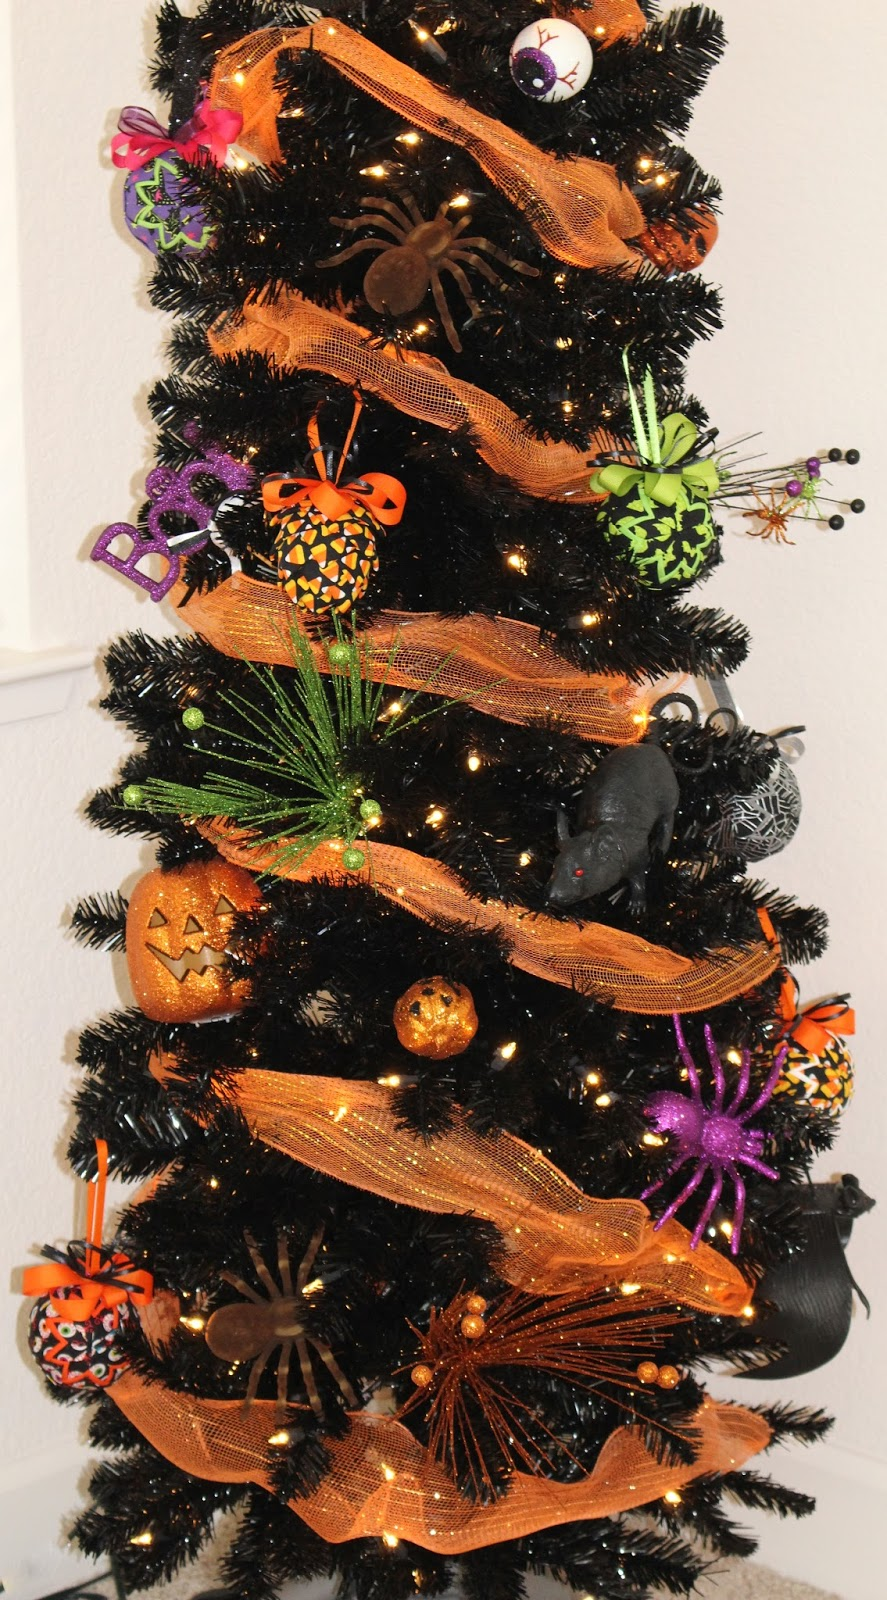 Crazy Shenanigans: The Halloween Tree